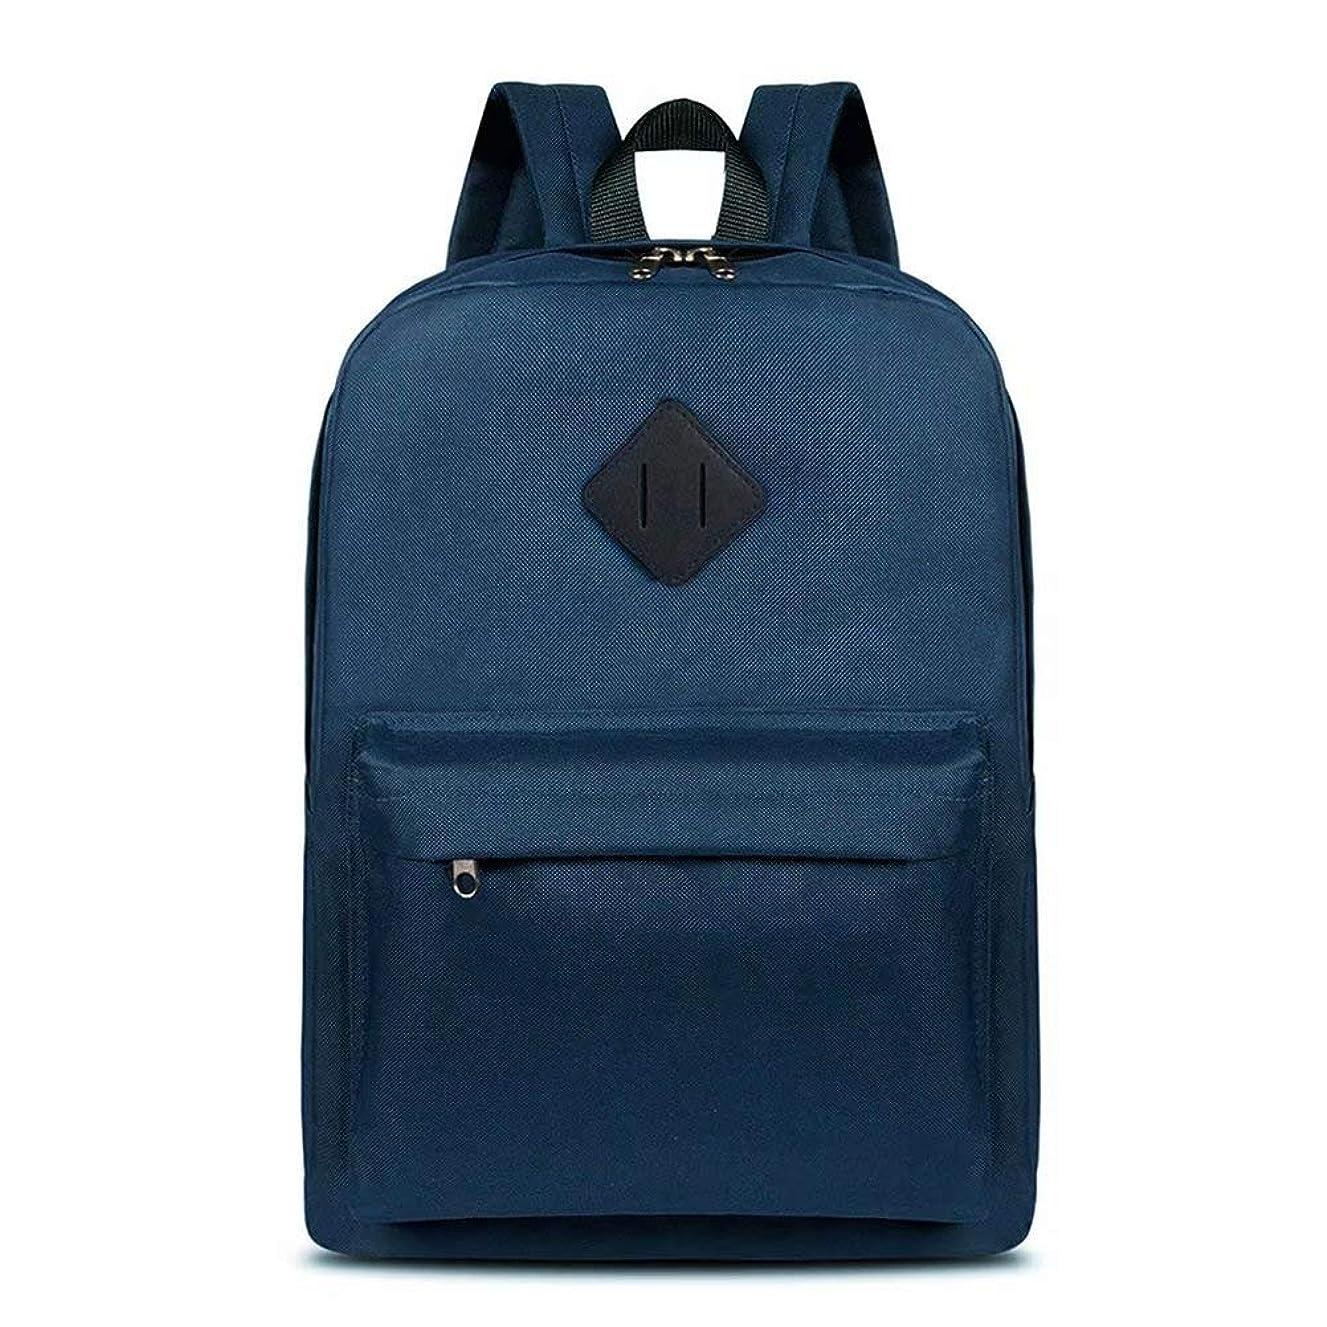 RUYEE Laptop School Backpack, Waterproof School Backpack for Men Women, Lightweight Anti-Theft Travel Daypack College Student Rucksack Fits 14-inch Computer/MacBook Blue